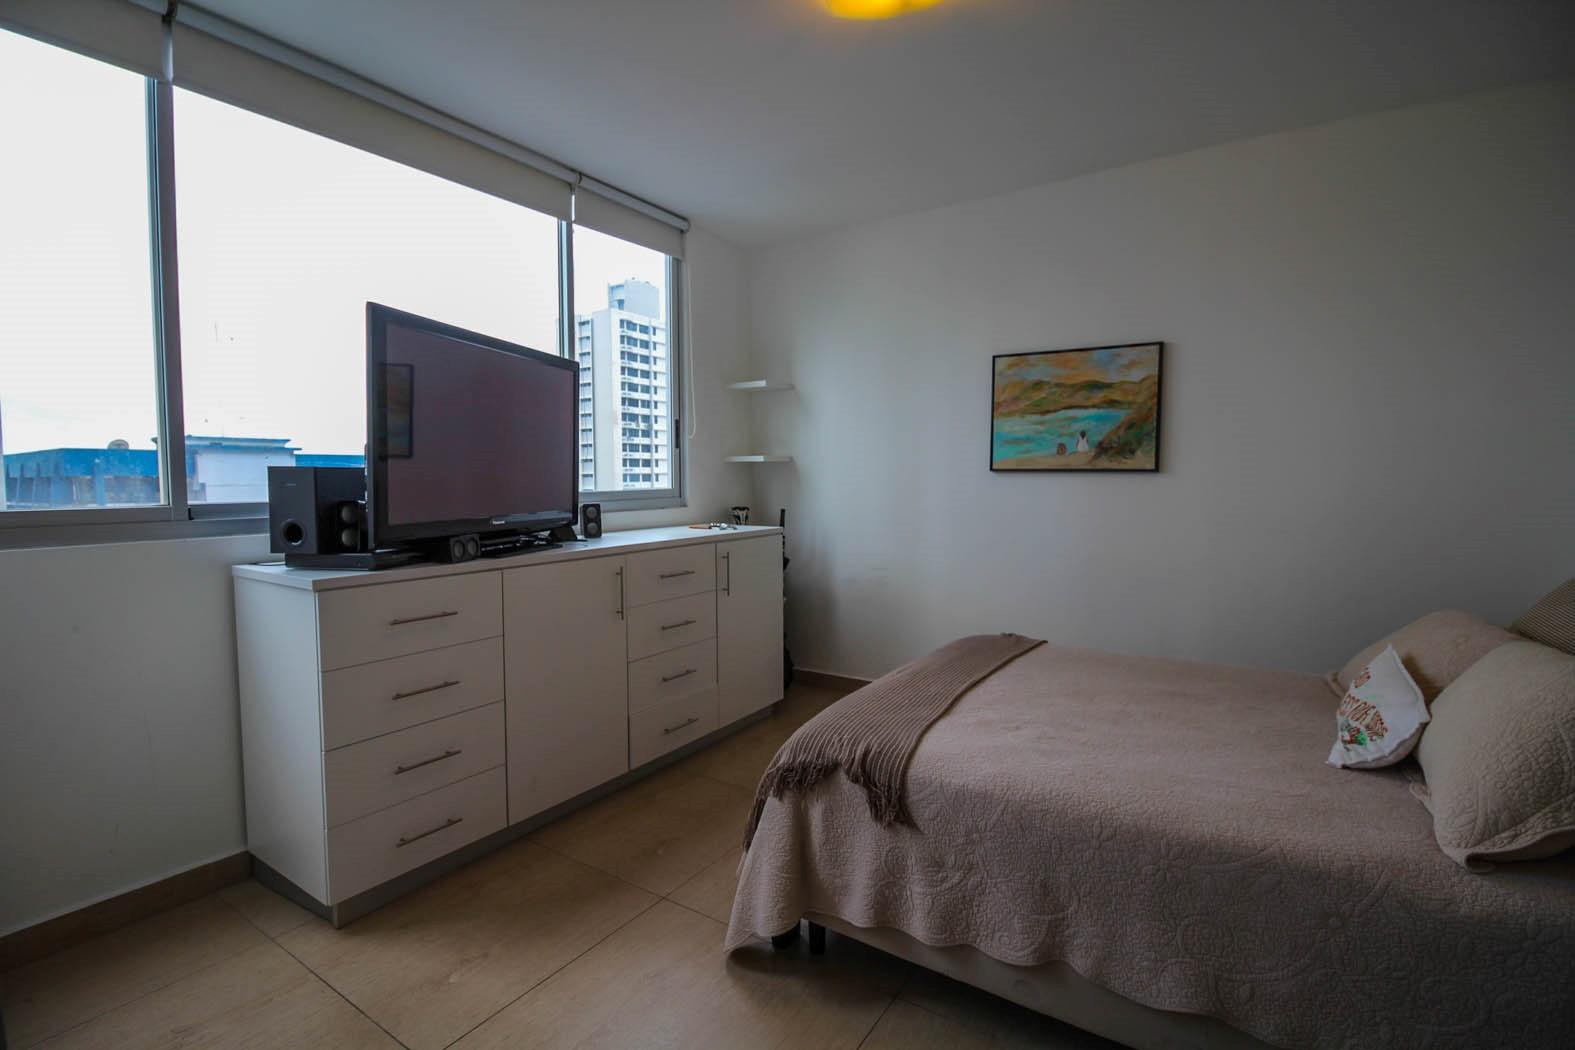 Avenida-Balboa-Panama-property-panamaequityocean-city-views-2nd-line-balboa-ave-10.jpg